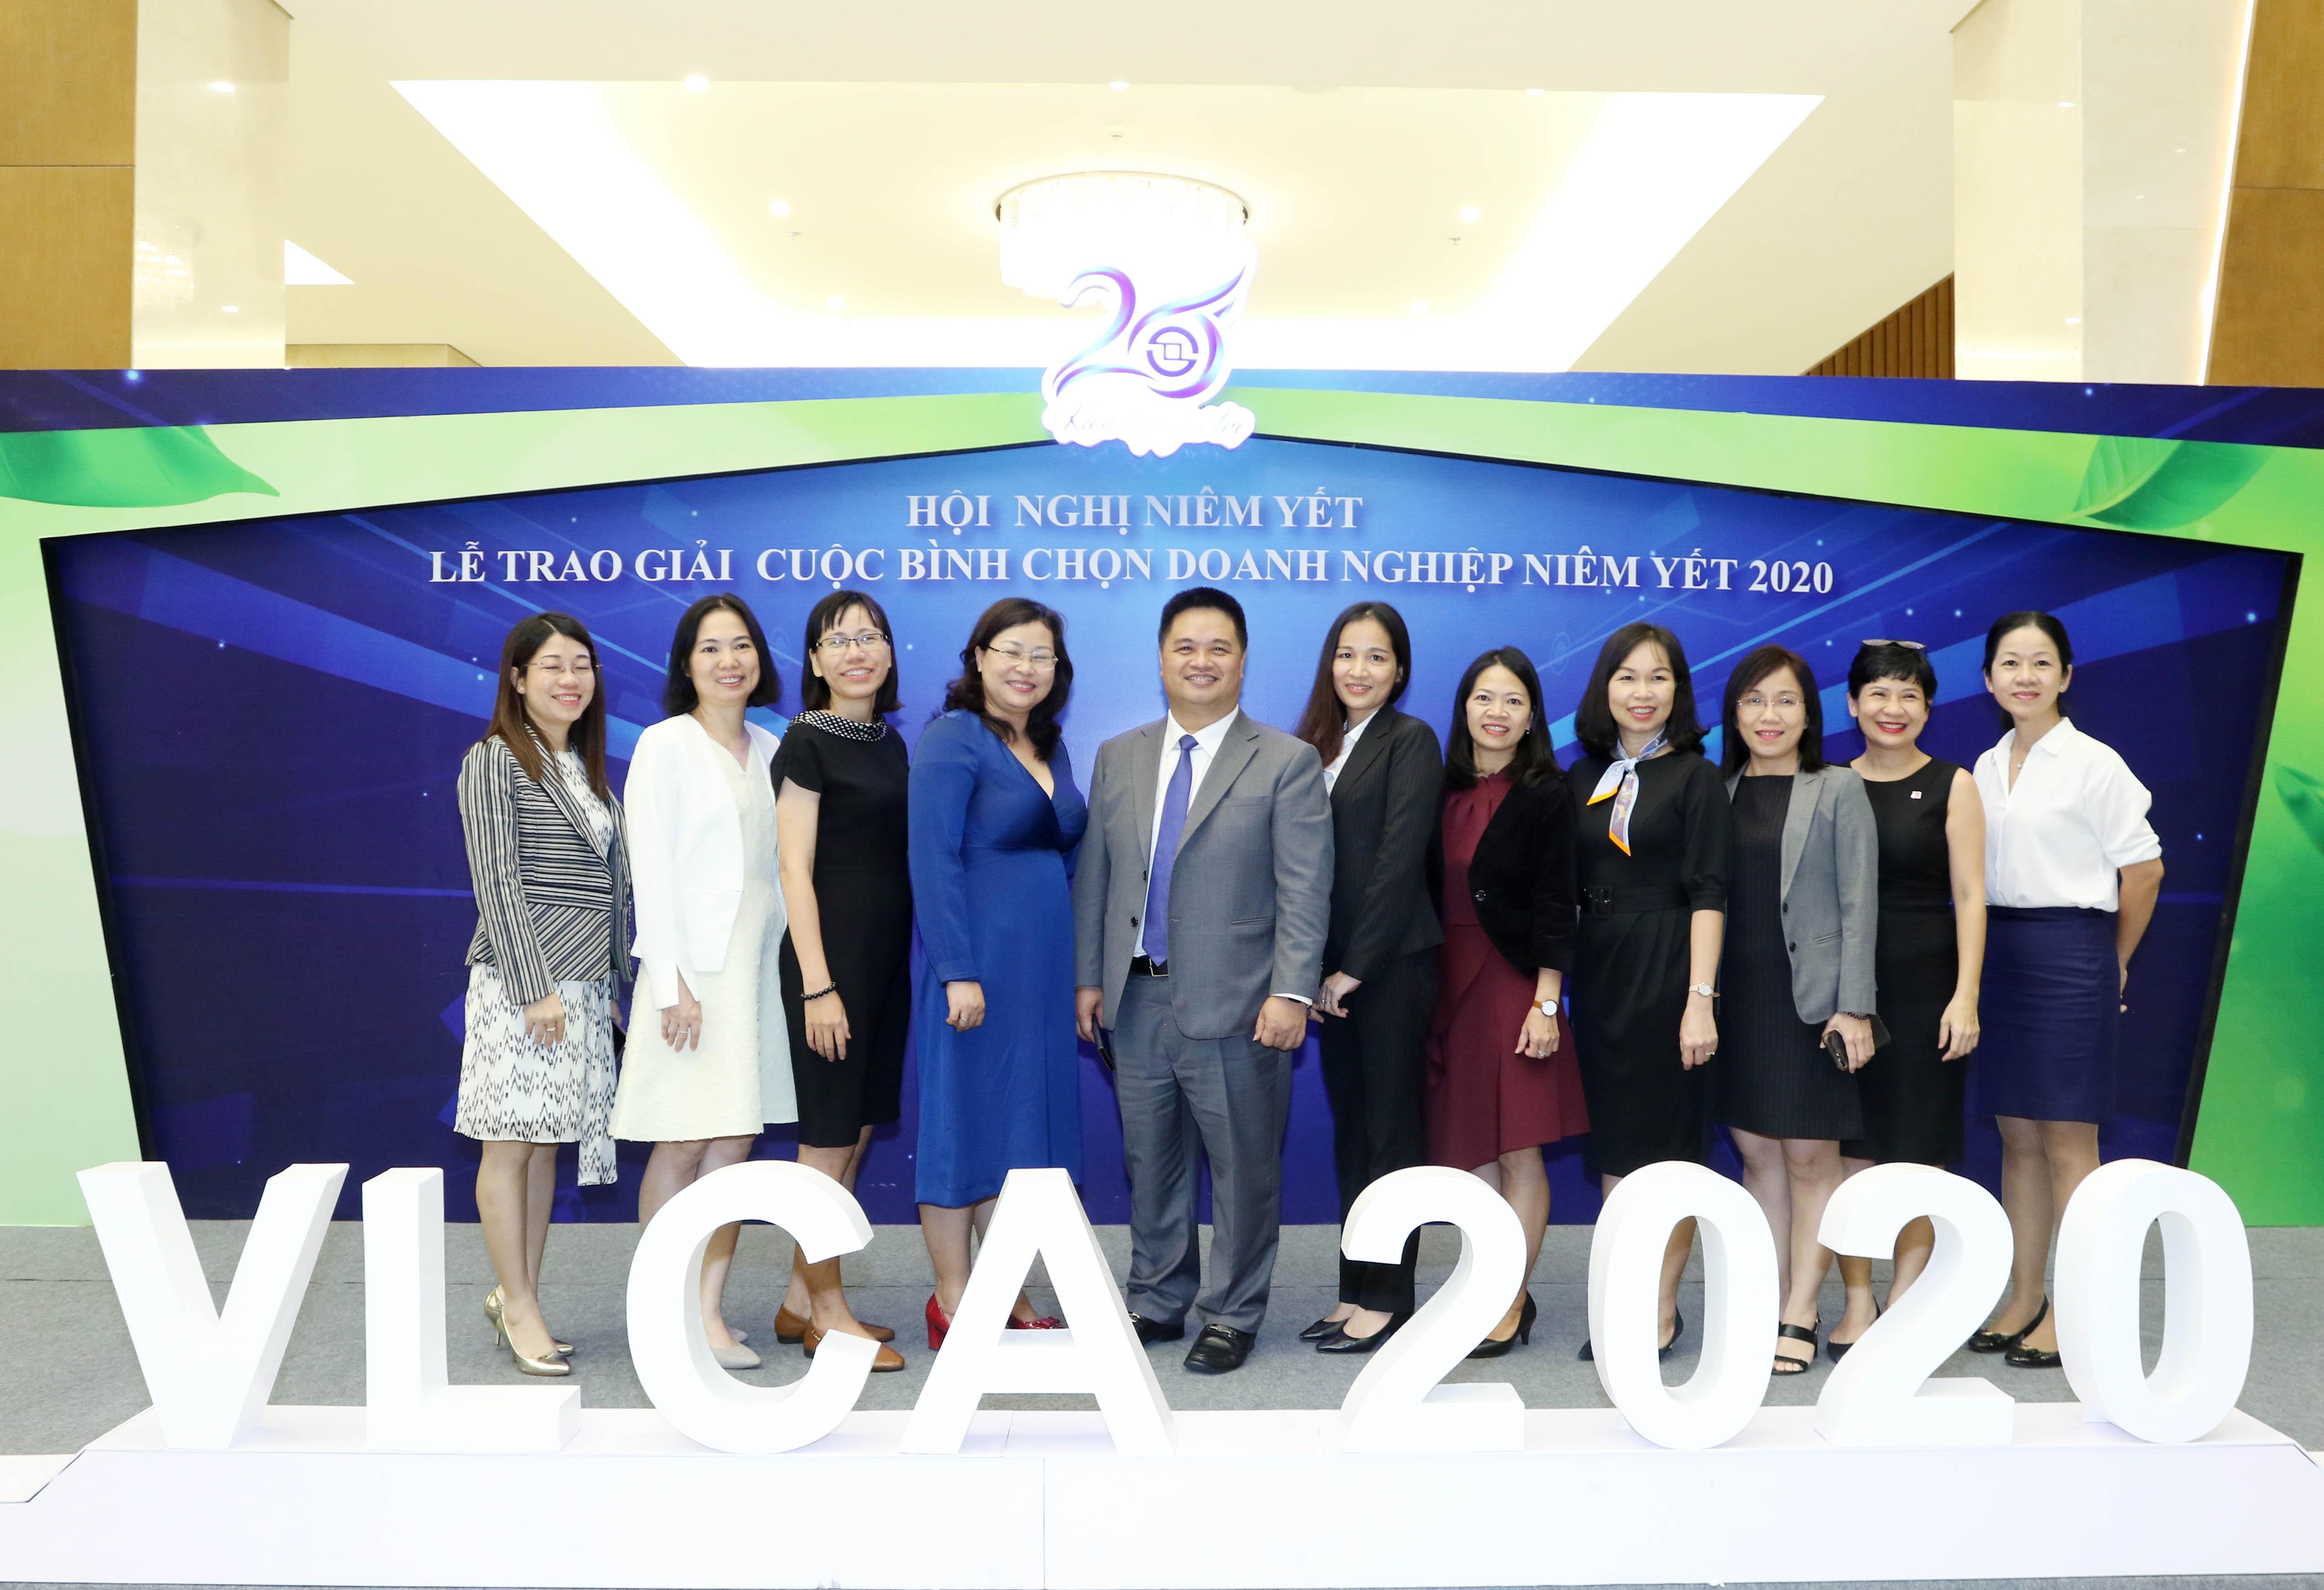 https://www.aravietnam.vn/wp-content/uploads/2020/12/2F0A9428.jpg